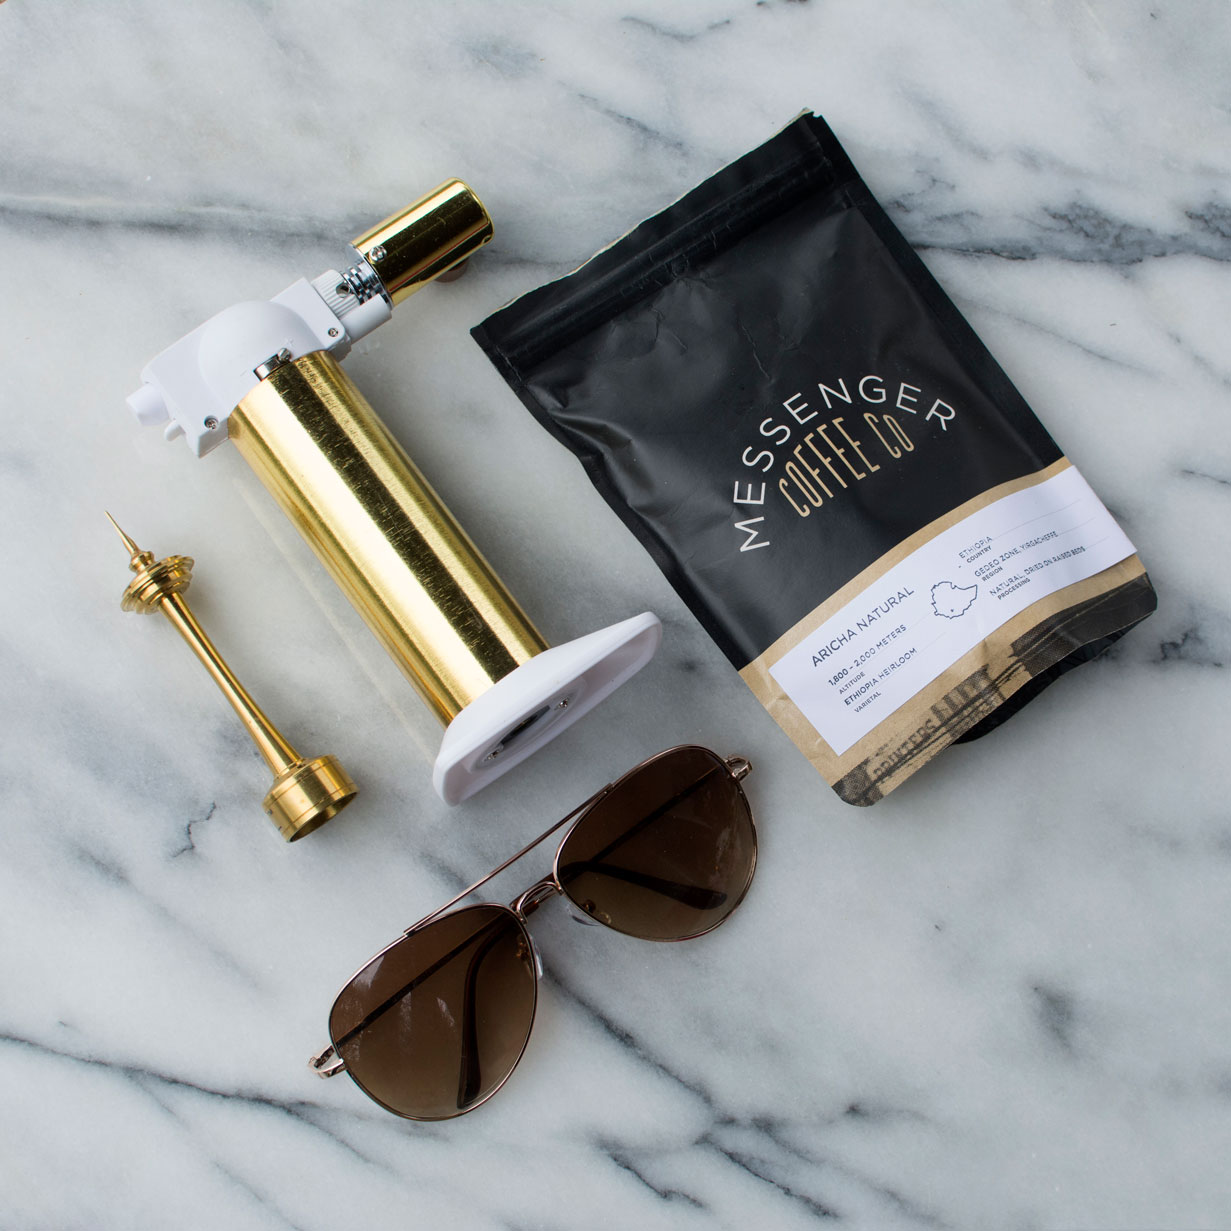 torch-dabber-coffee-flatlay-greenandgold.jpg